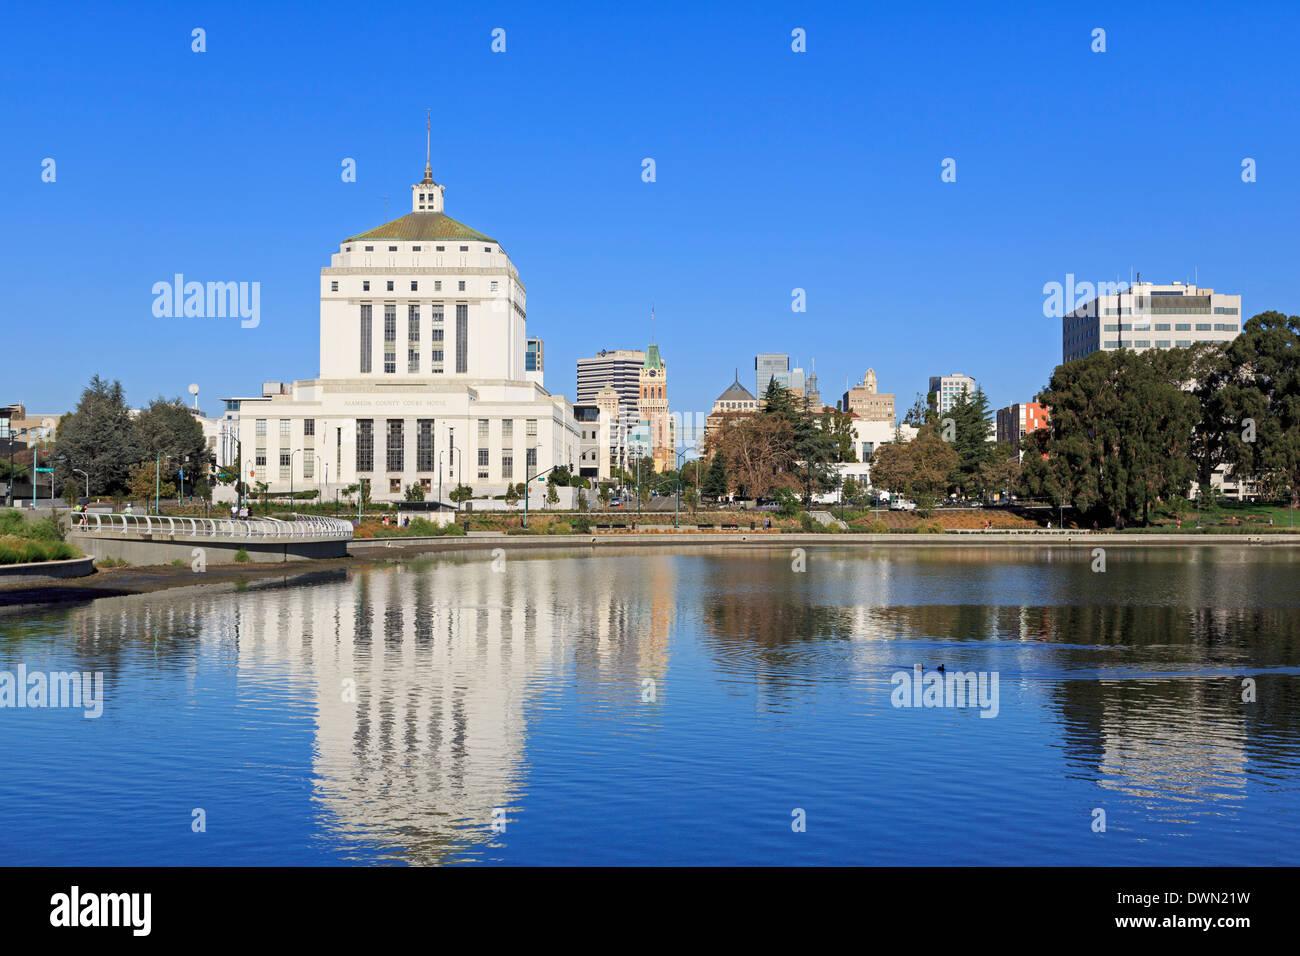 Alameda County Court House and Lake Merritt, Oakland, California, United States of America, North America - Stock Image